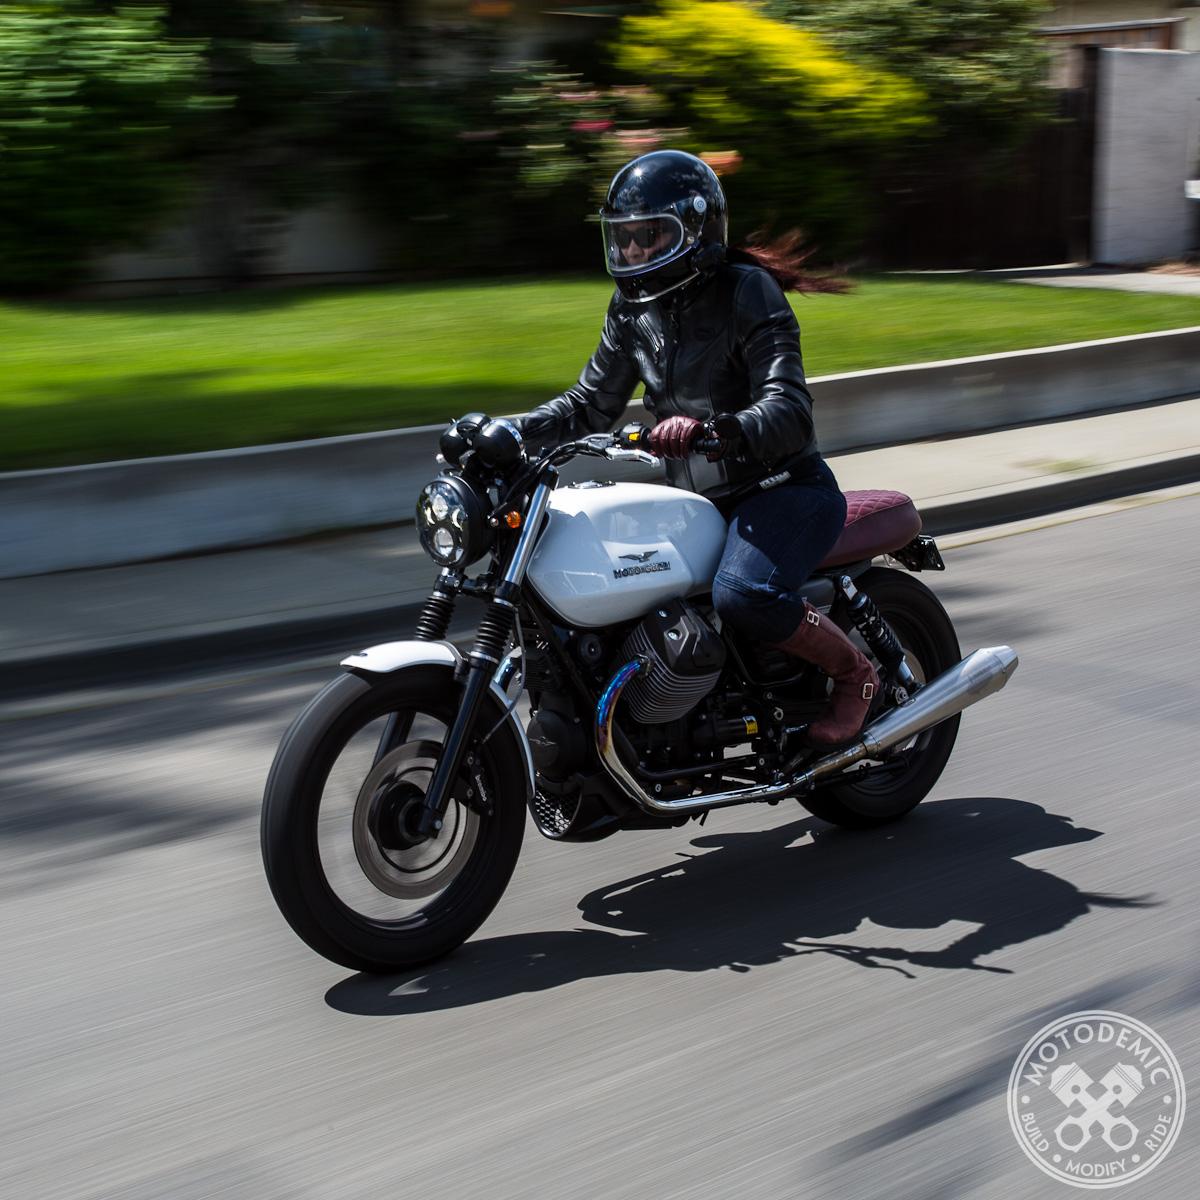 moto guzzi led headlight upgrade • motodemic